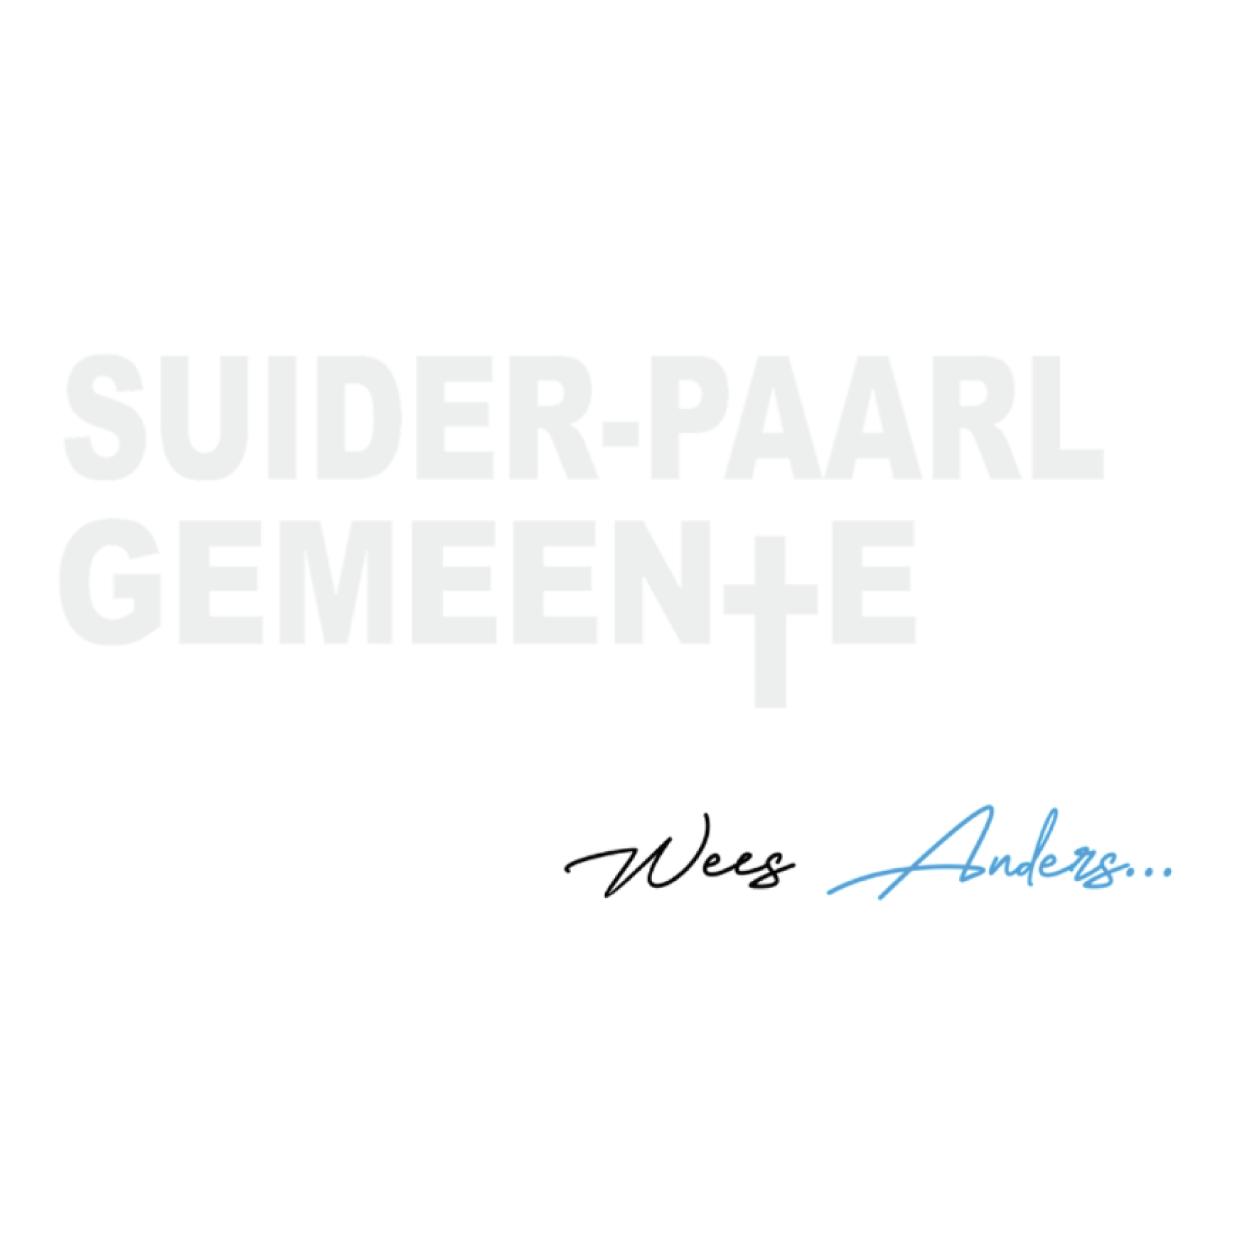 Suider Paarl Logo